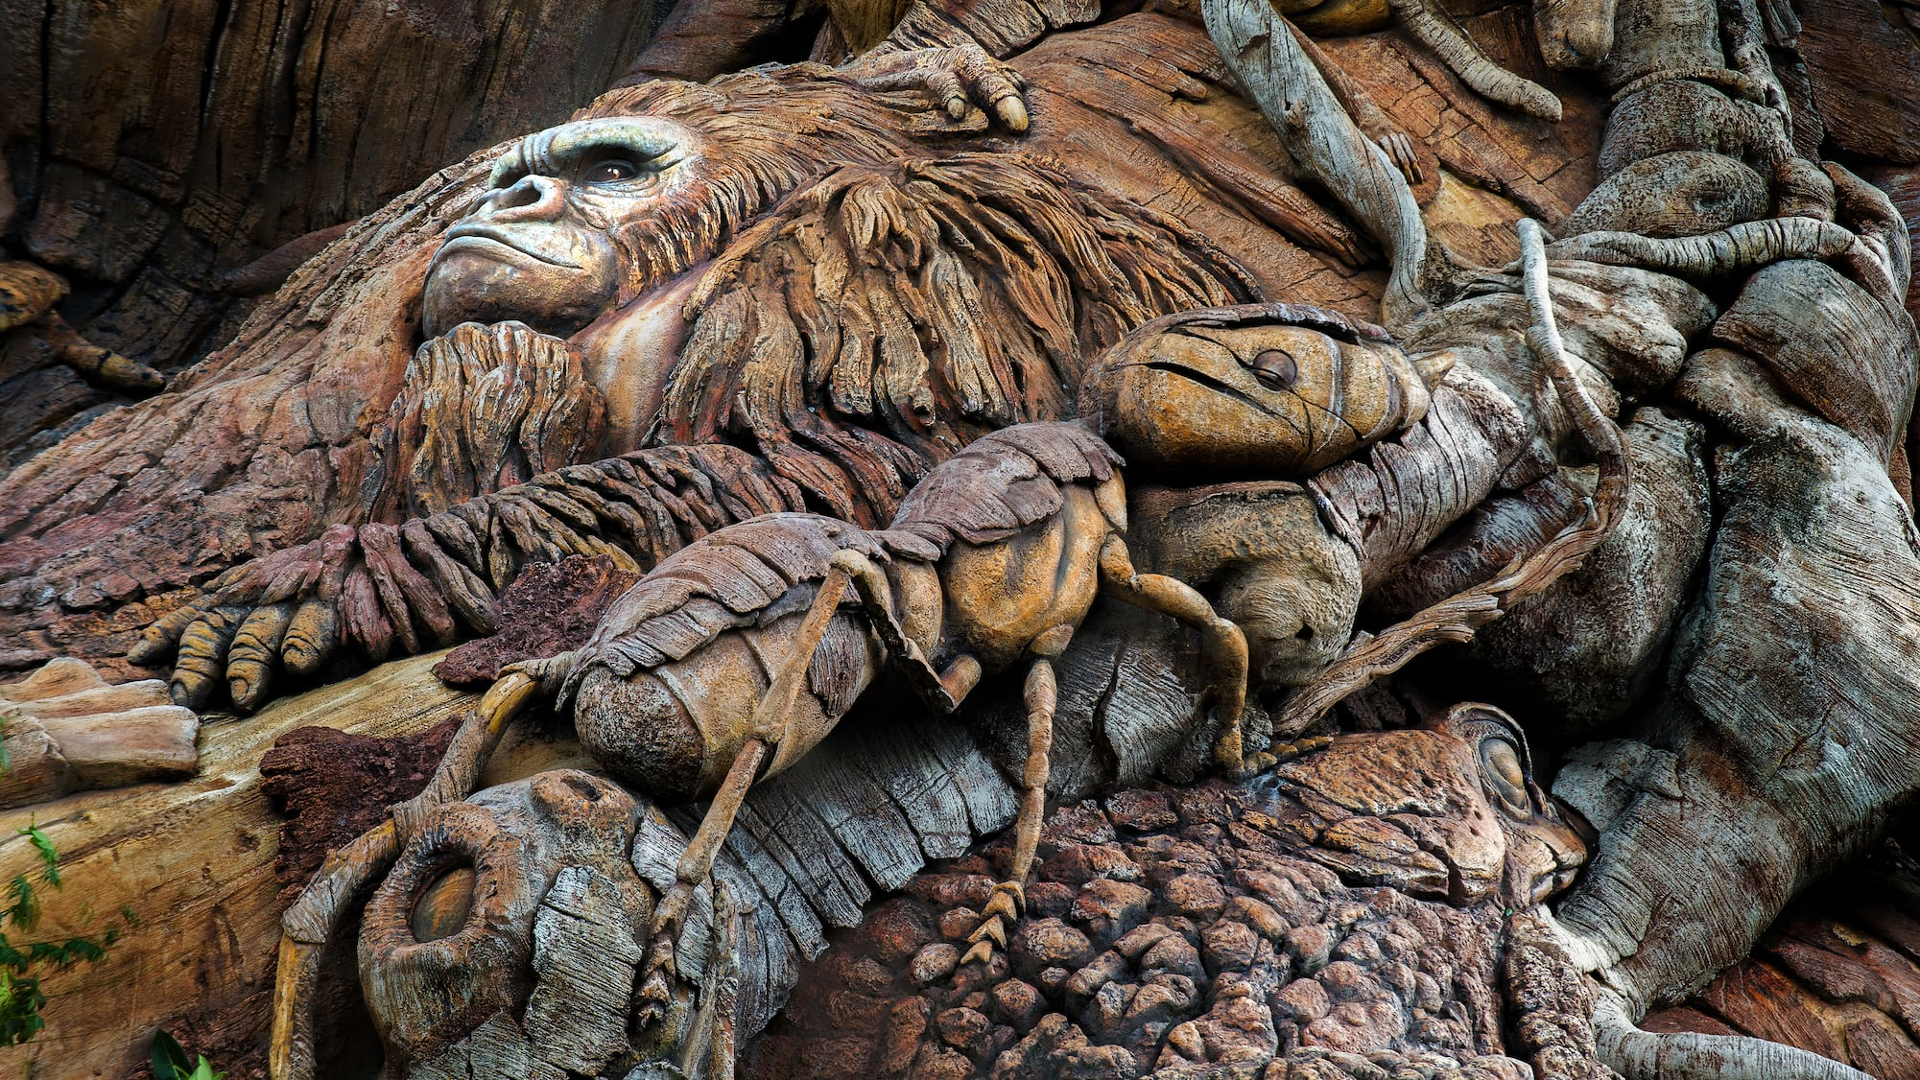 Tree Of Life Animal Kingdom Attractions Walt Disney World Resort